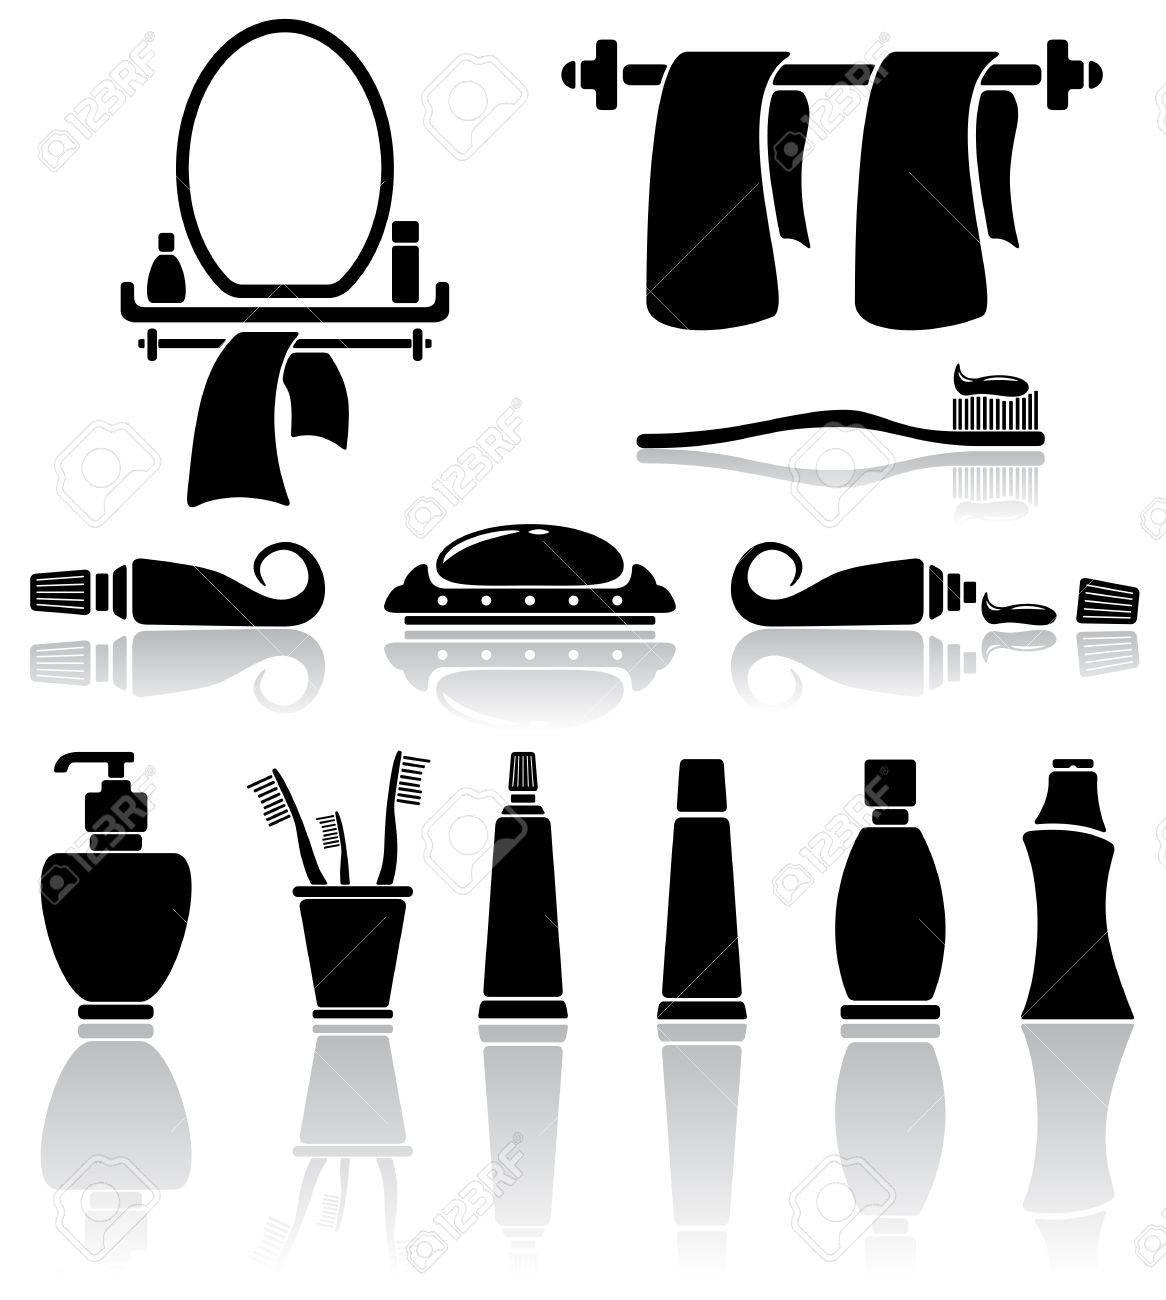 Set Of Black Bathroom Icons Illustration Royalty Free Cliparts. Bathroom Icon